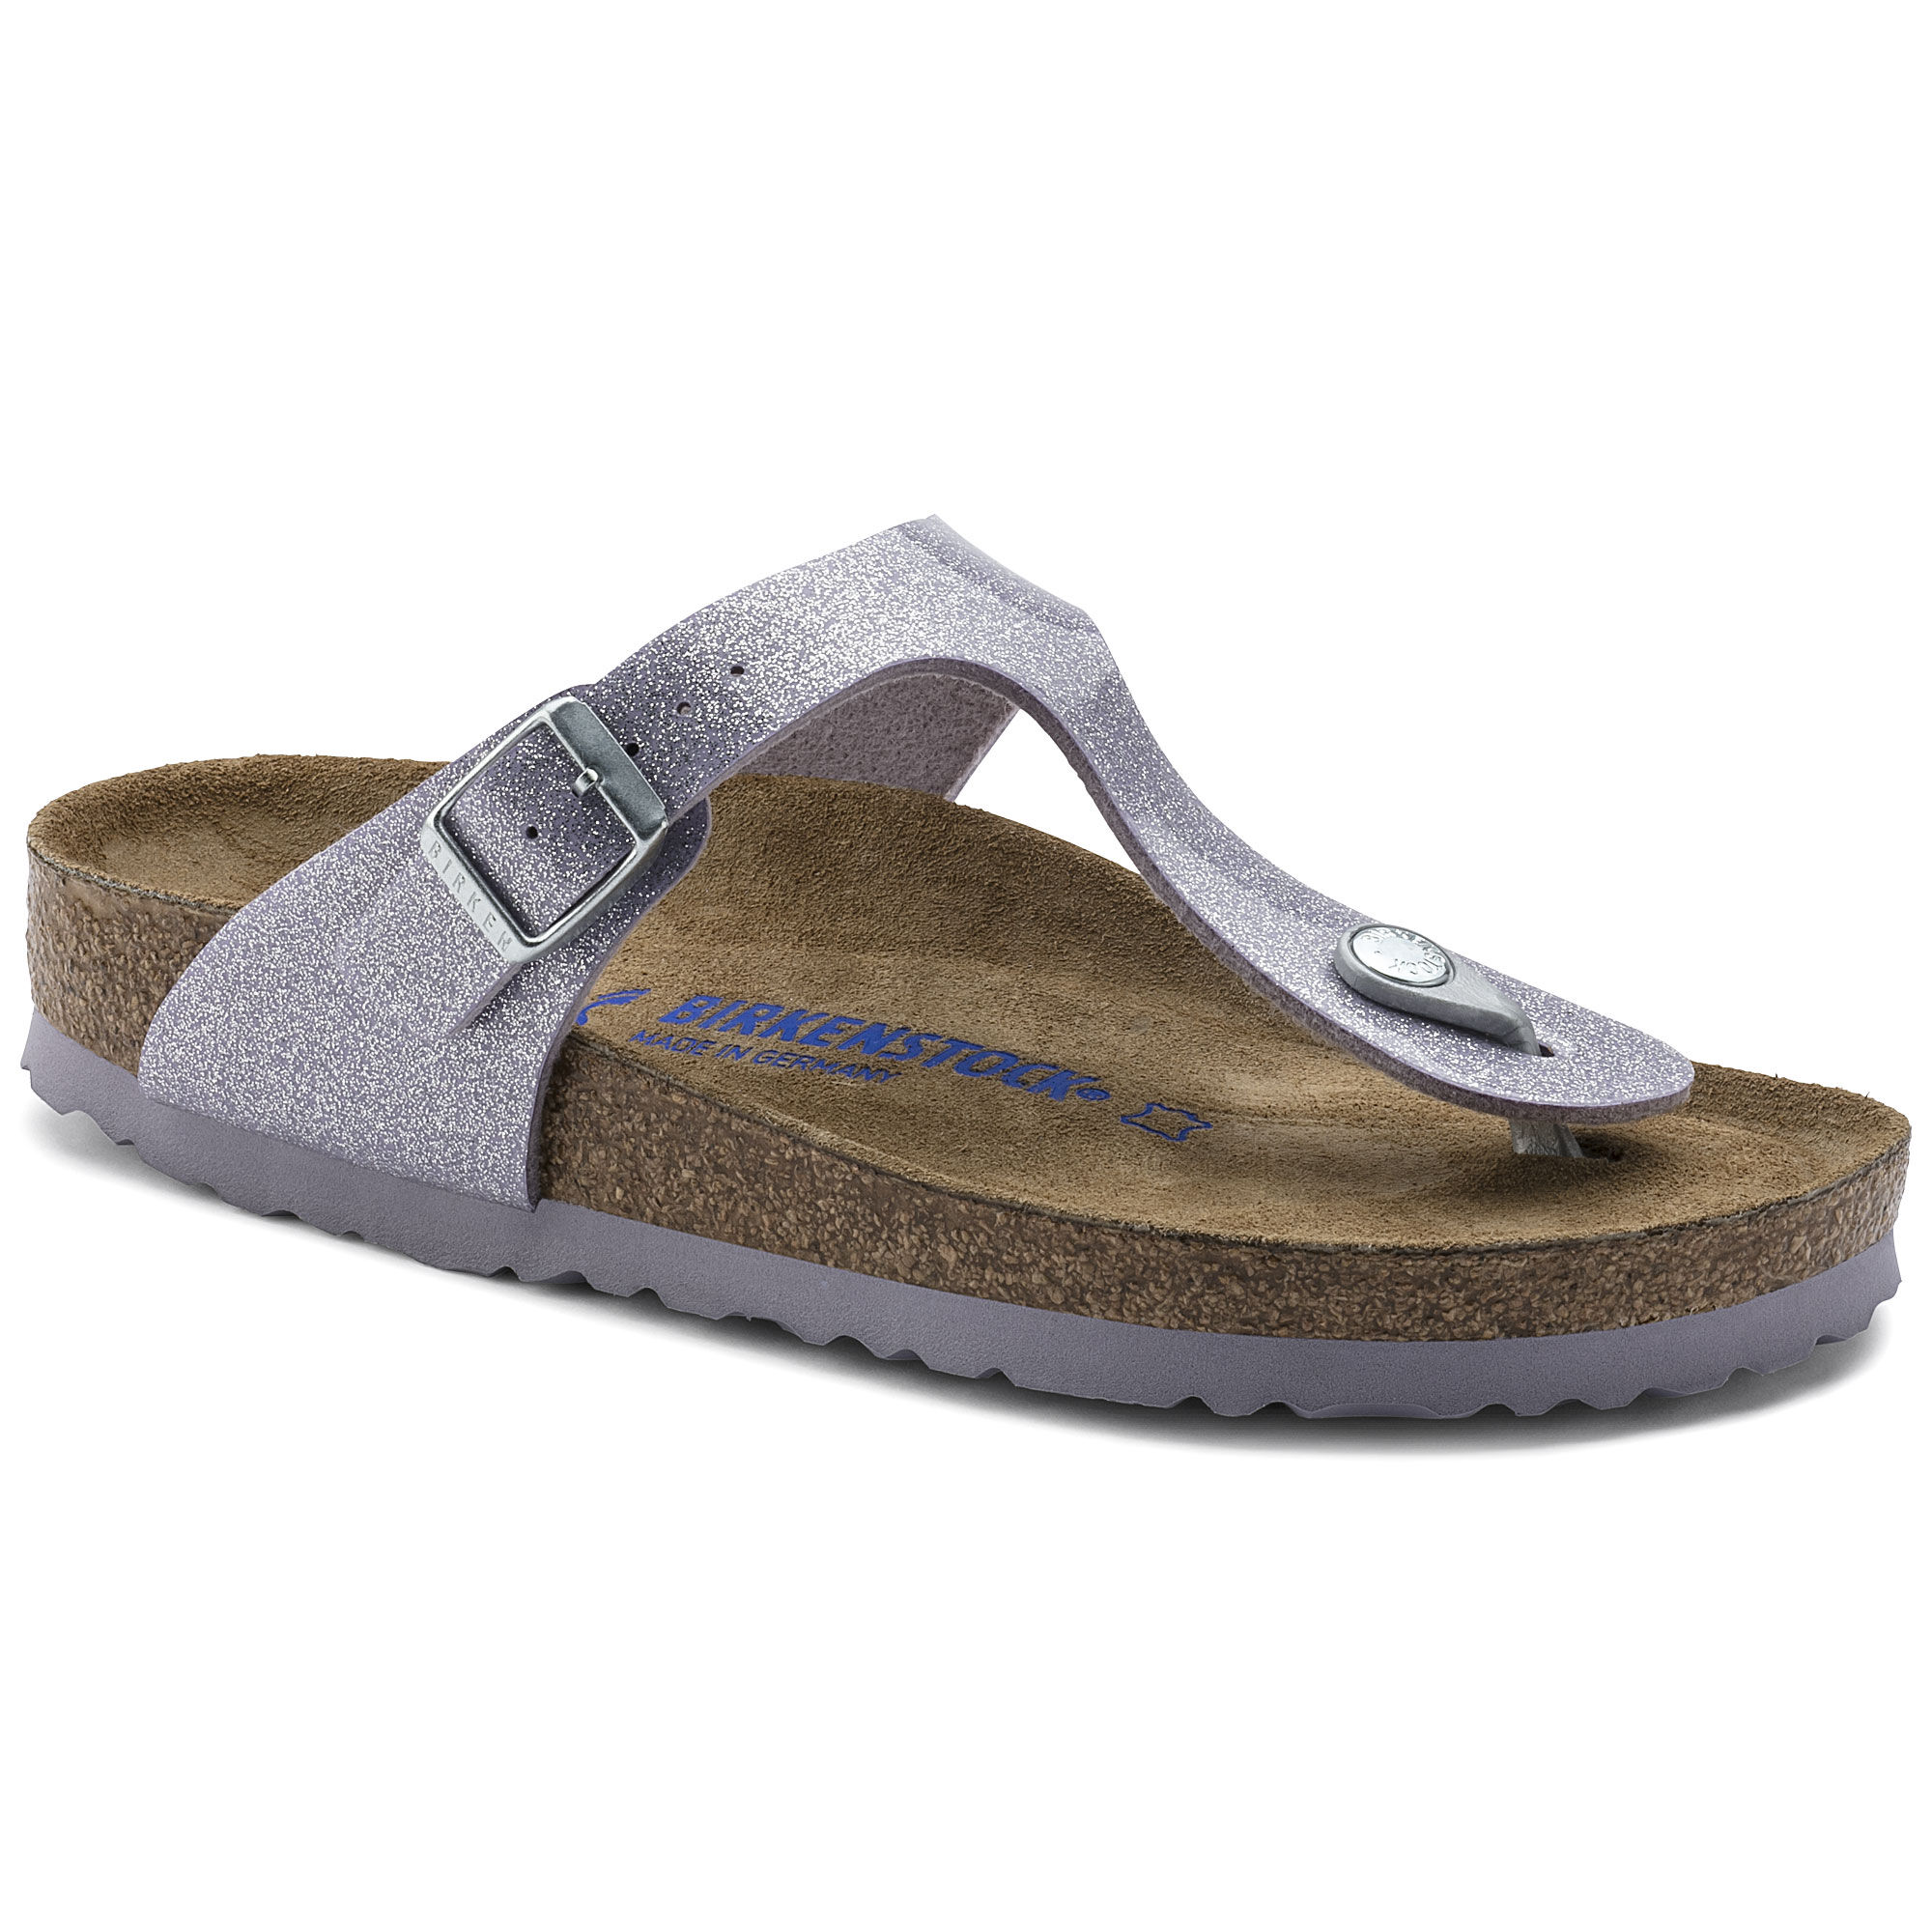 Sandale Birkenstock Lavande « Gizeh » bhnS0kI